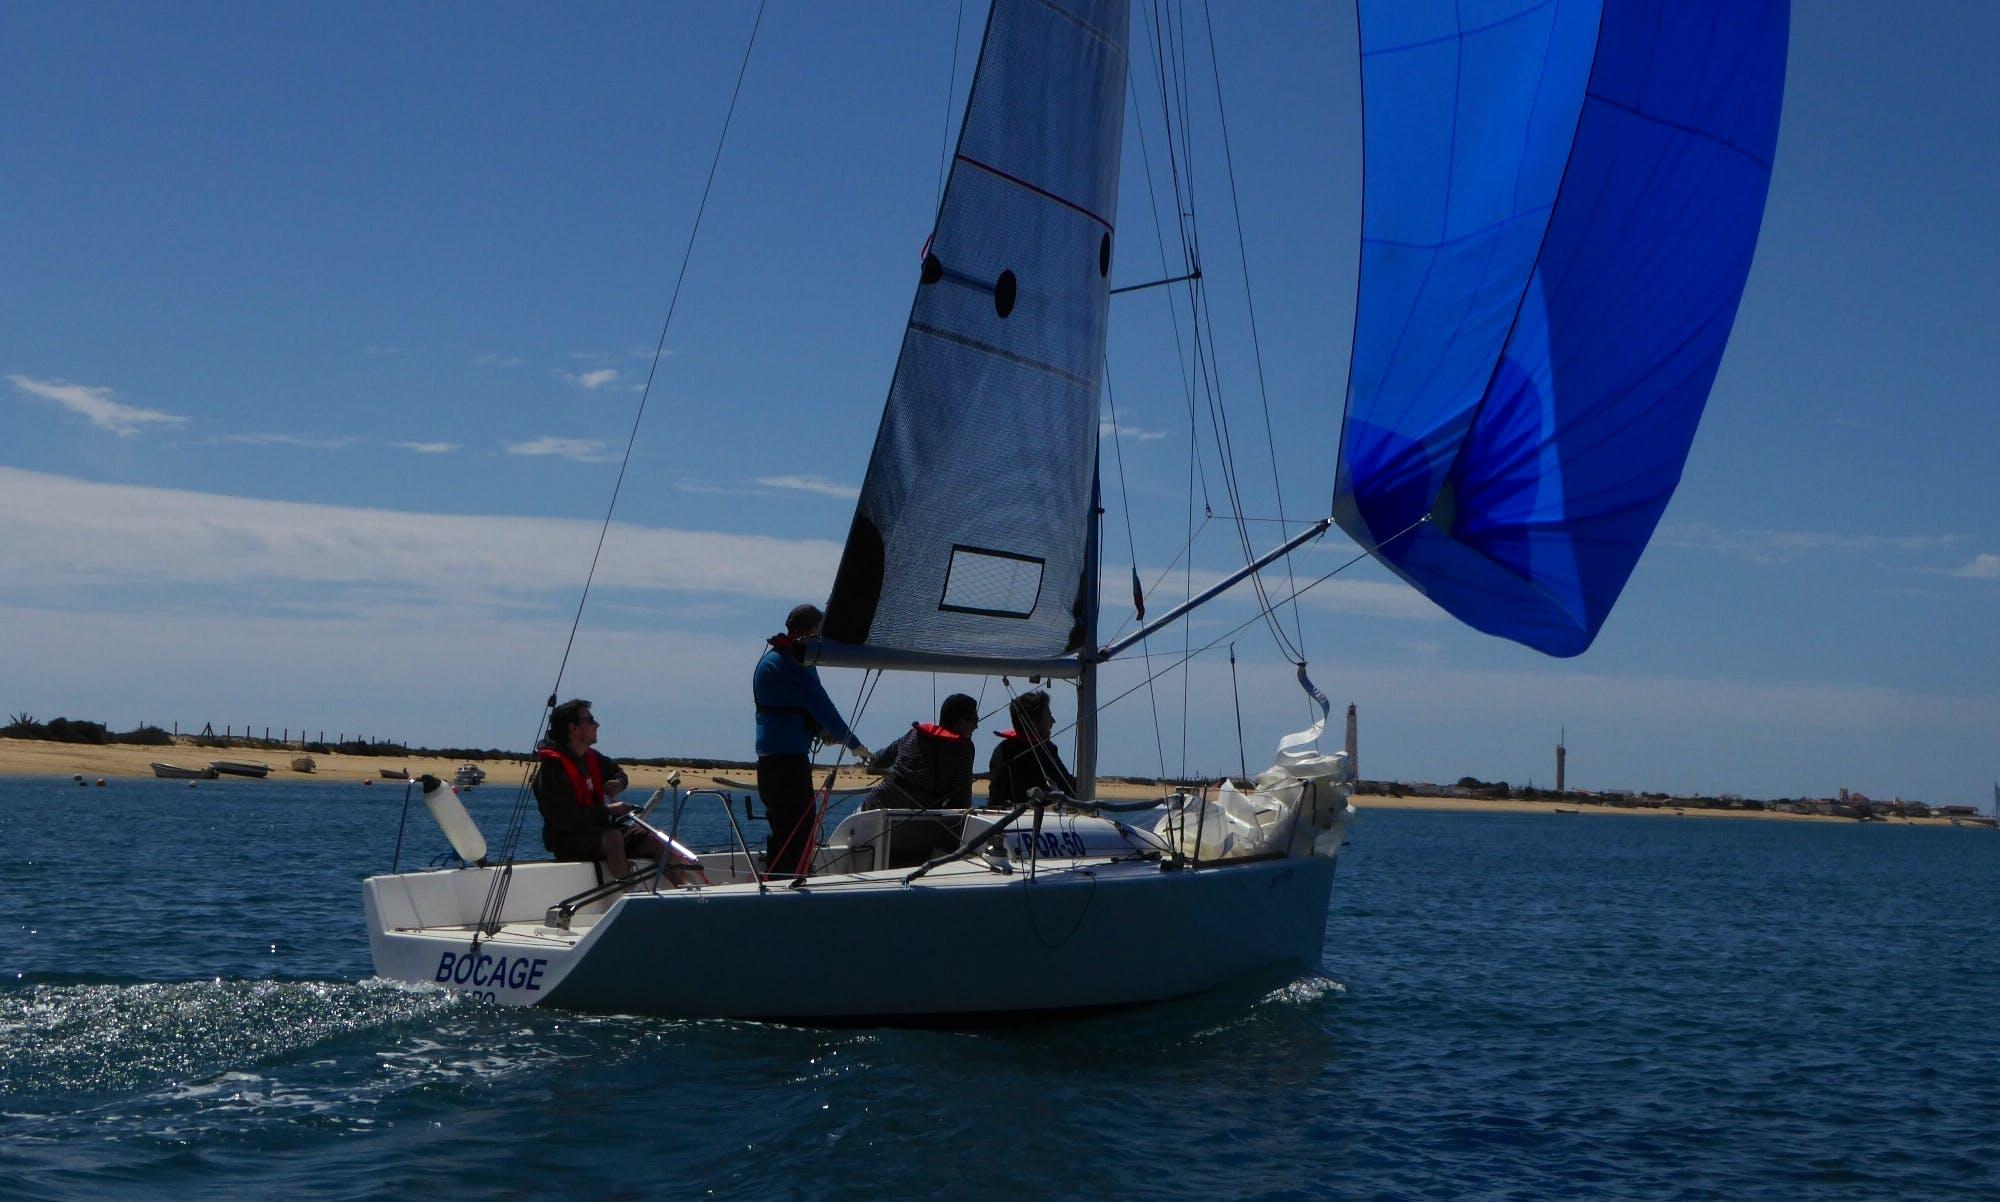 25ft Daysailer Boat Rental In Faro, Portugal